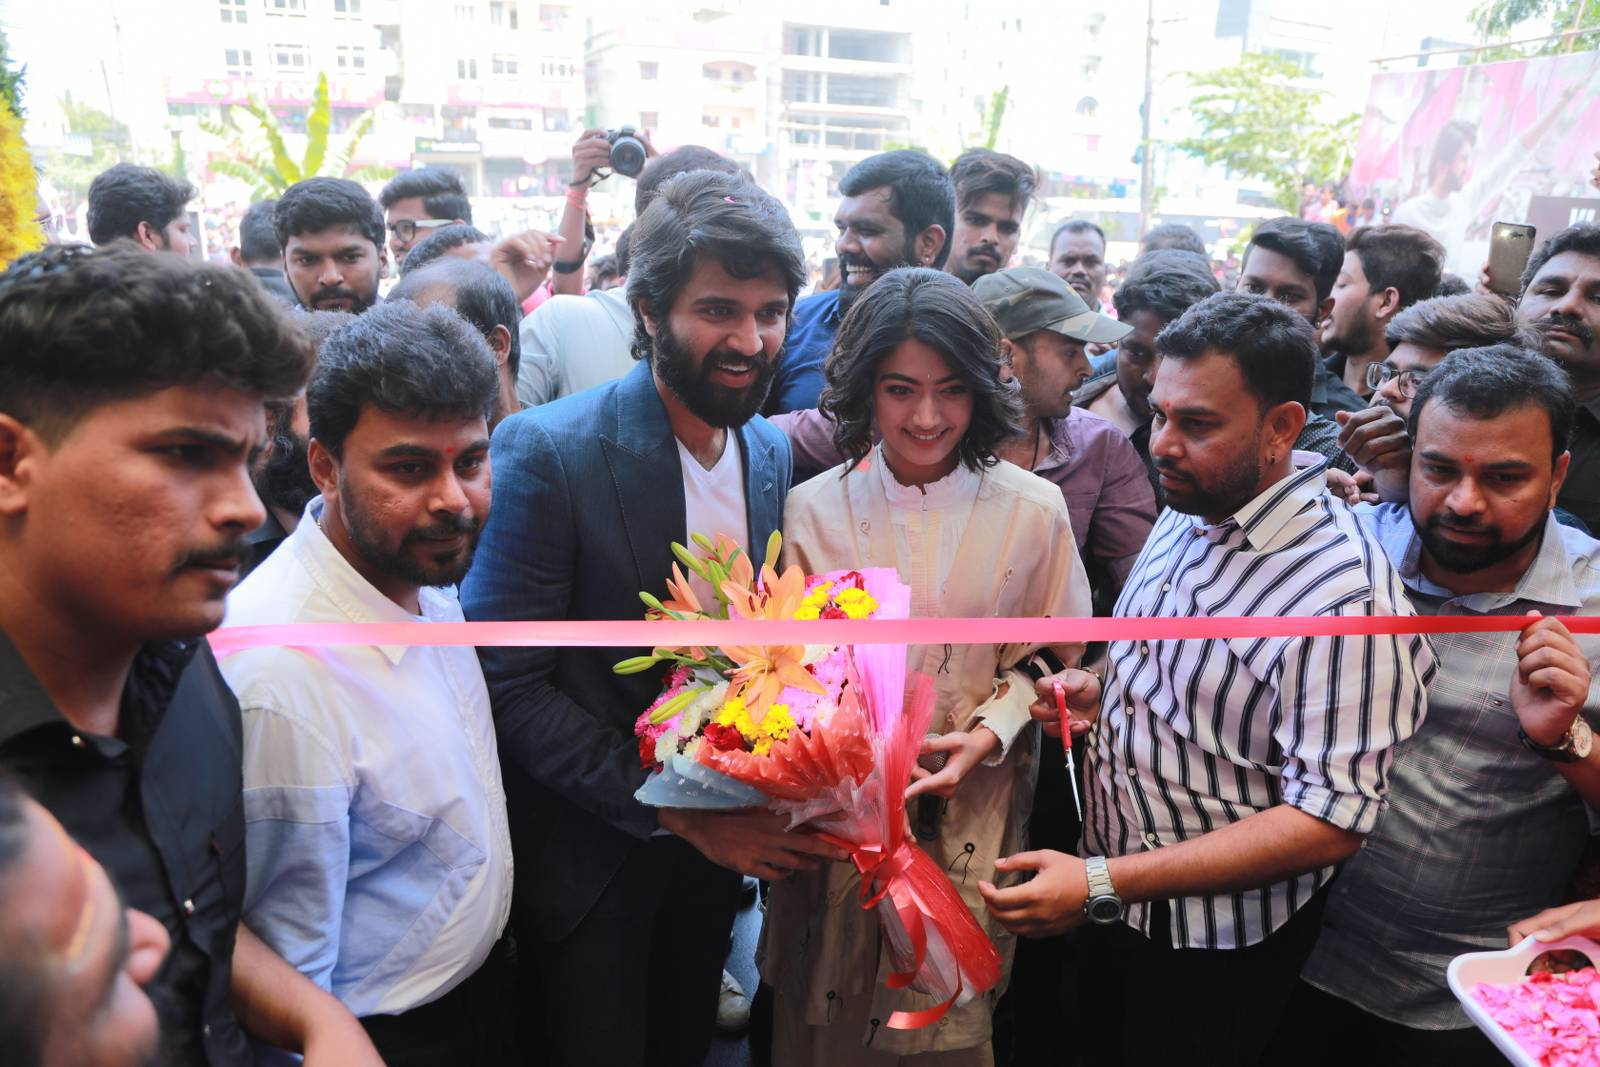 KLM fashion mall Inaugurated by Vijay devarakonda at Chandanagar 14